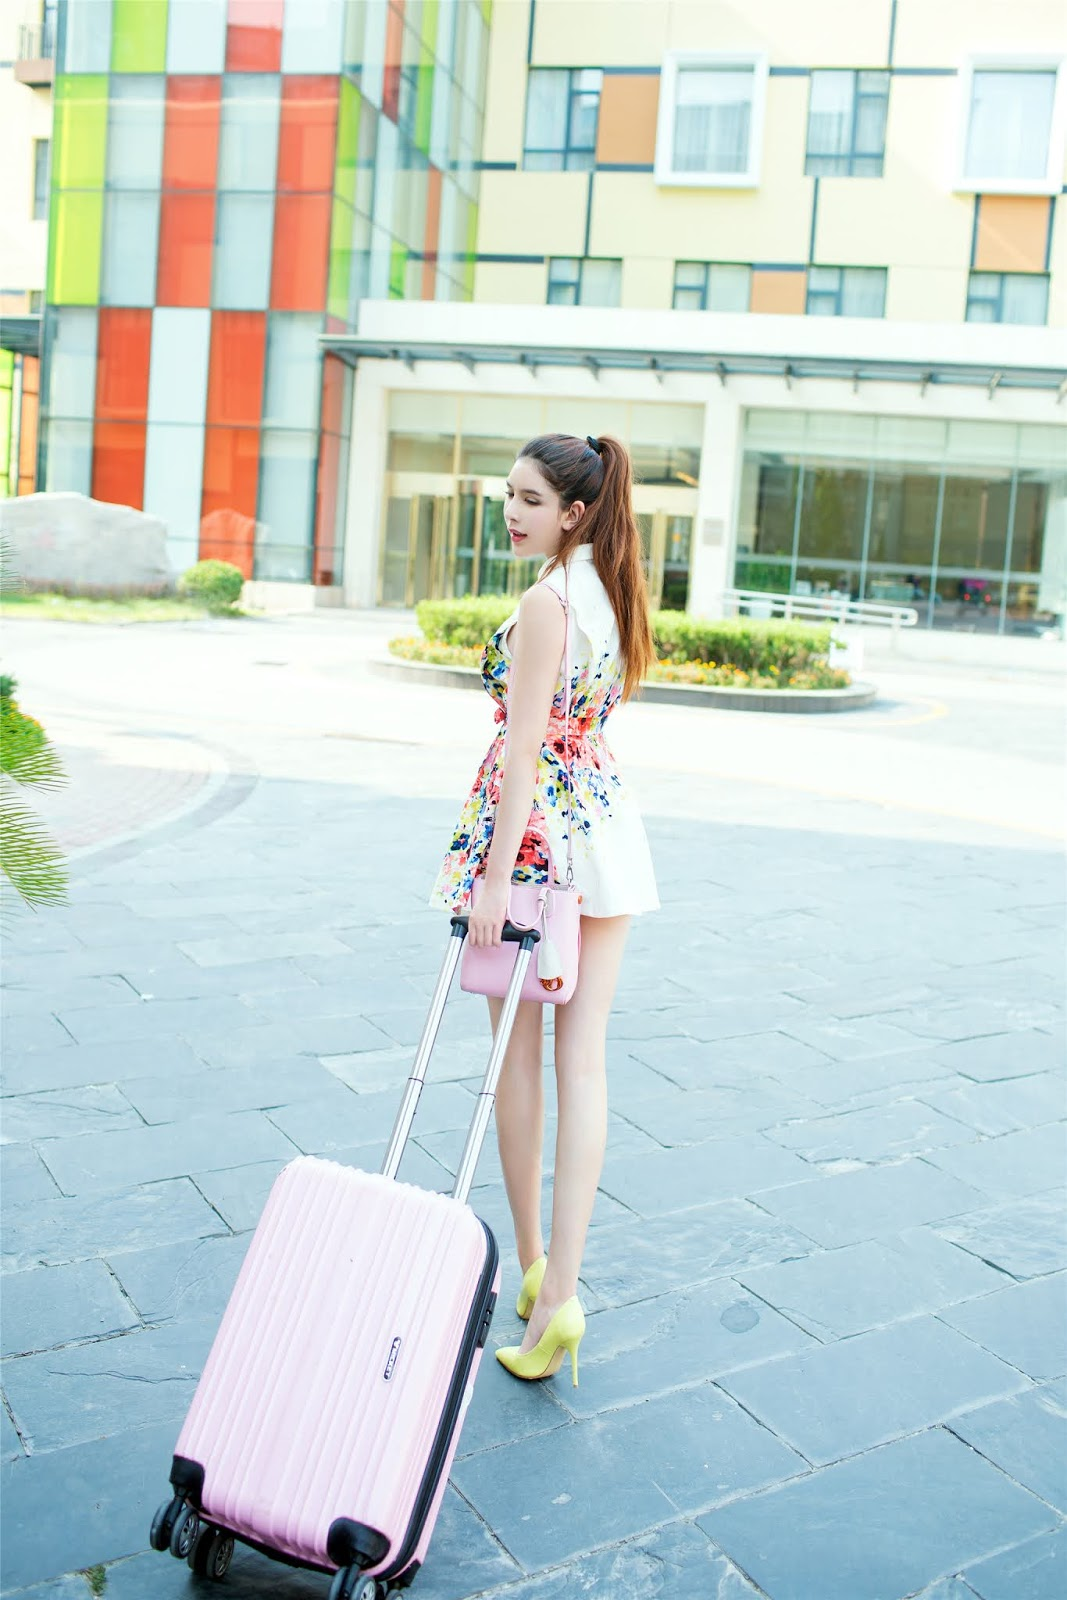 BoolWowGirls%2B%252834%2529 - Li LiSha 李丽莎 Beautiful Nude Model